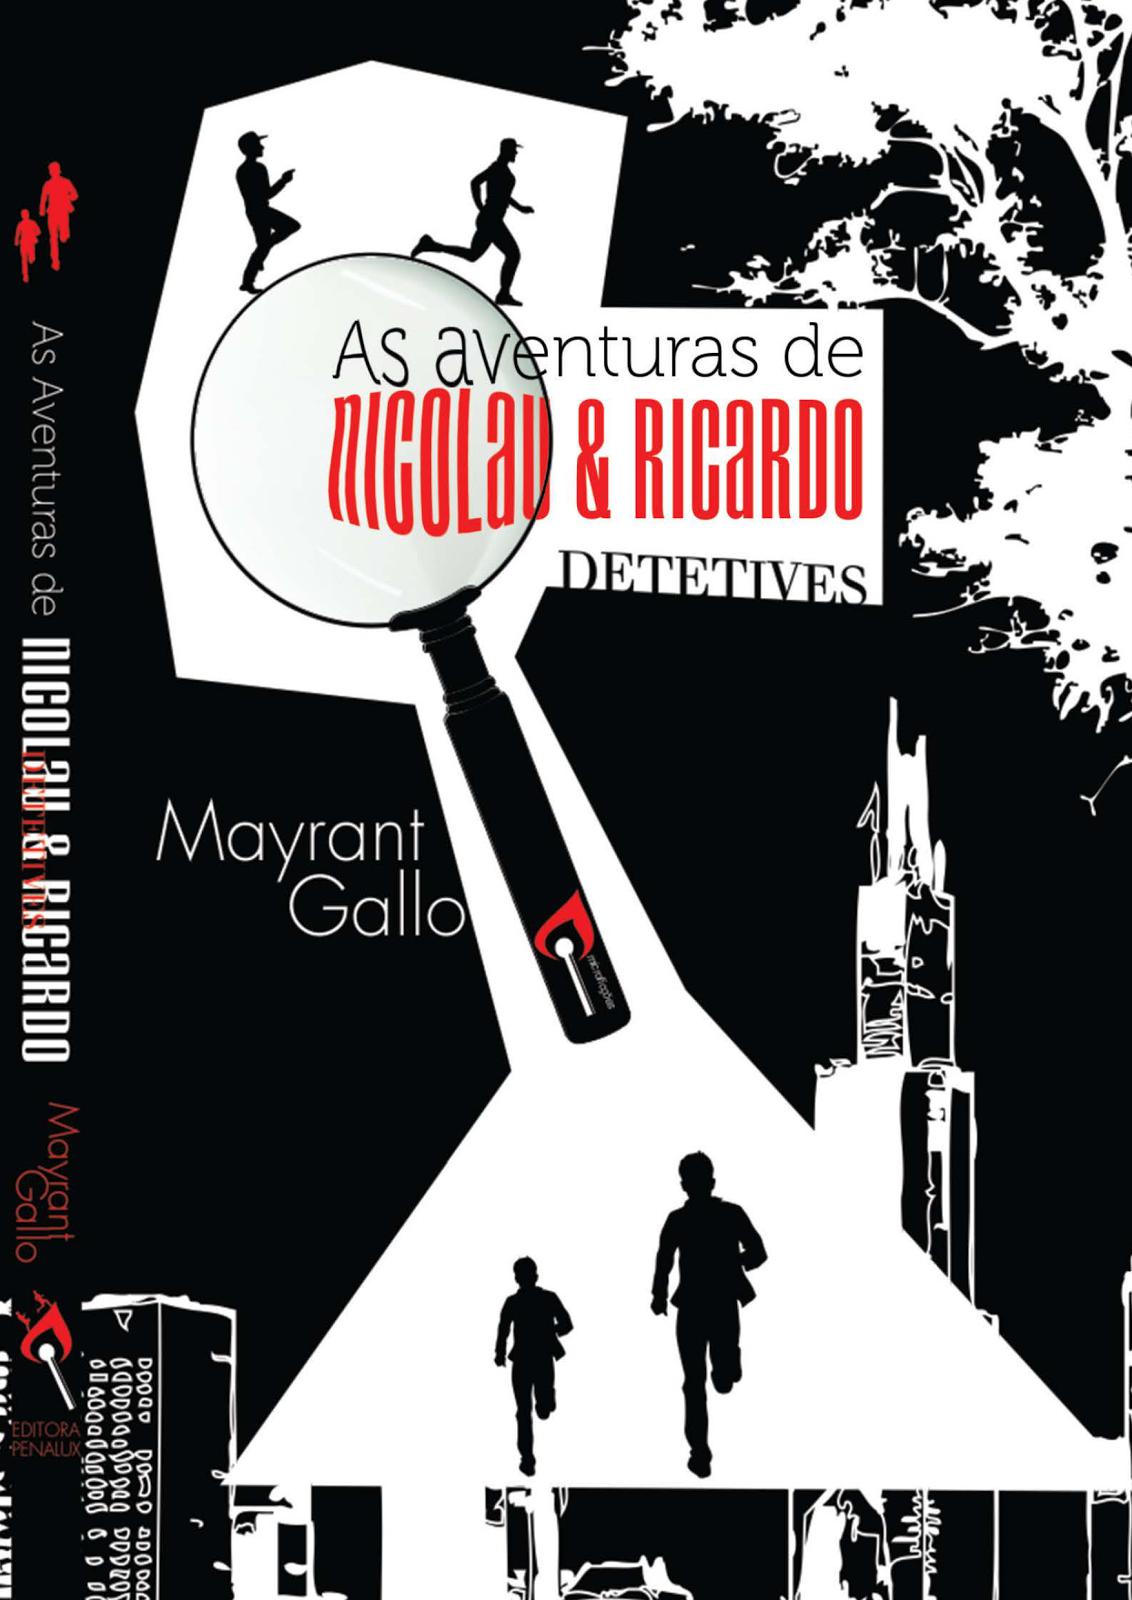 Nicolau & Ricardo